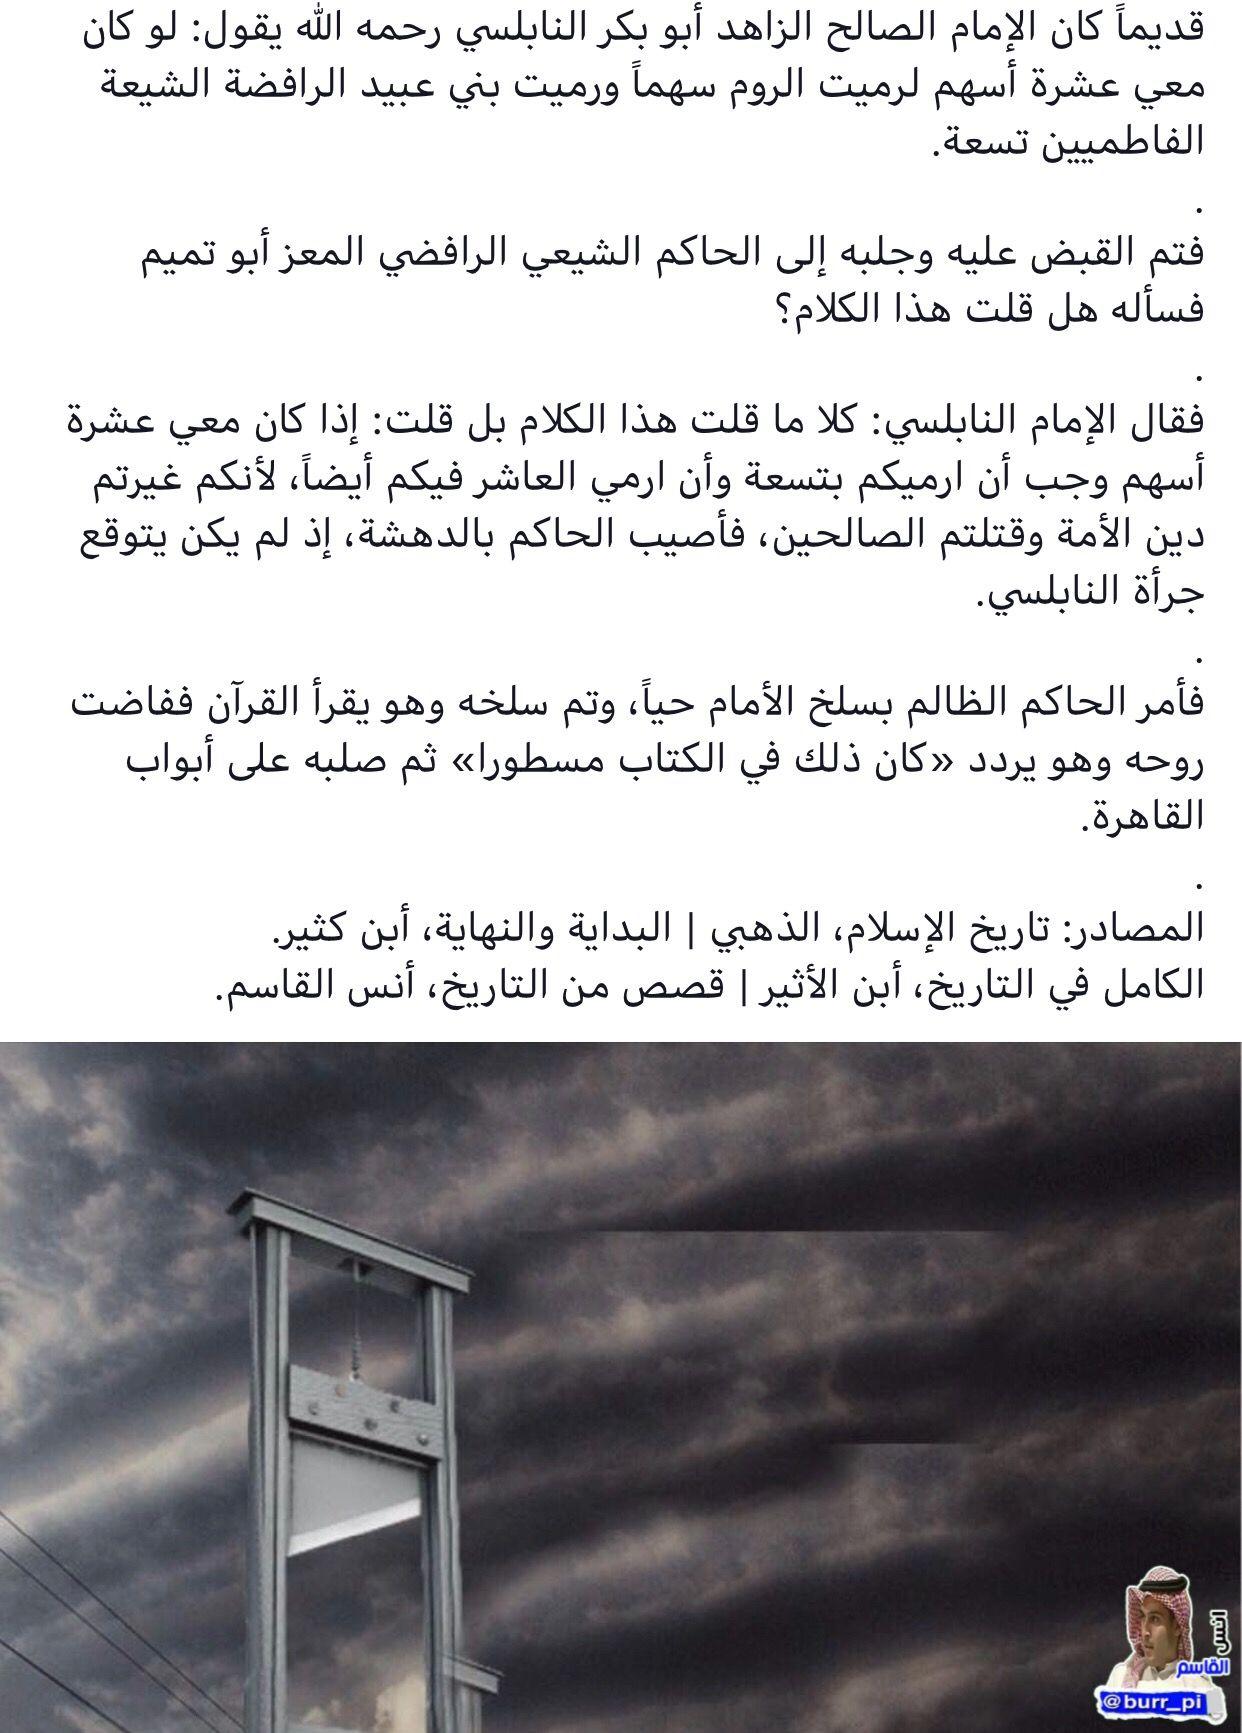 Pin By أنس القاسم On قصص من التاريخ Cards Against Humanity Islam Human